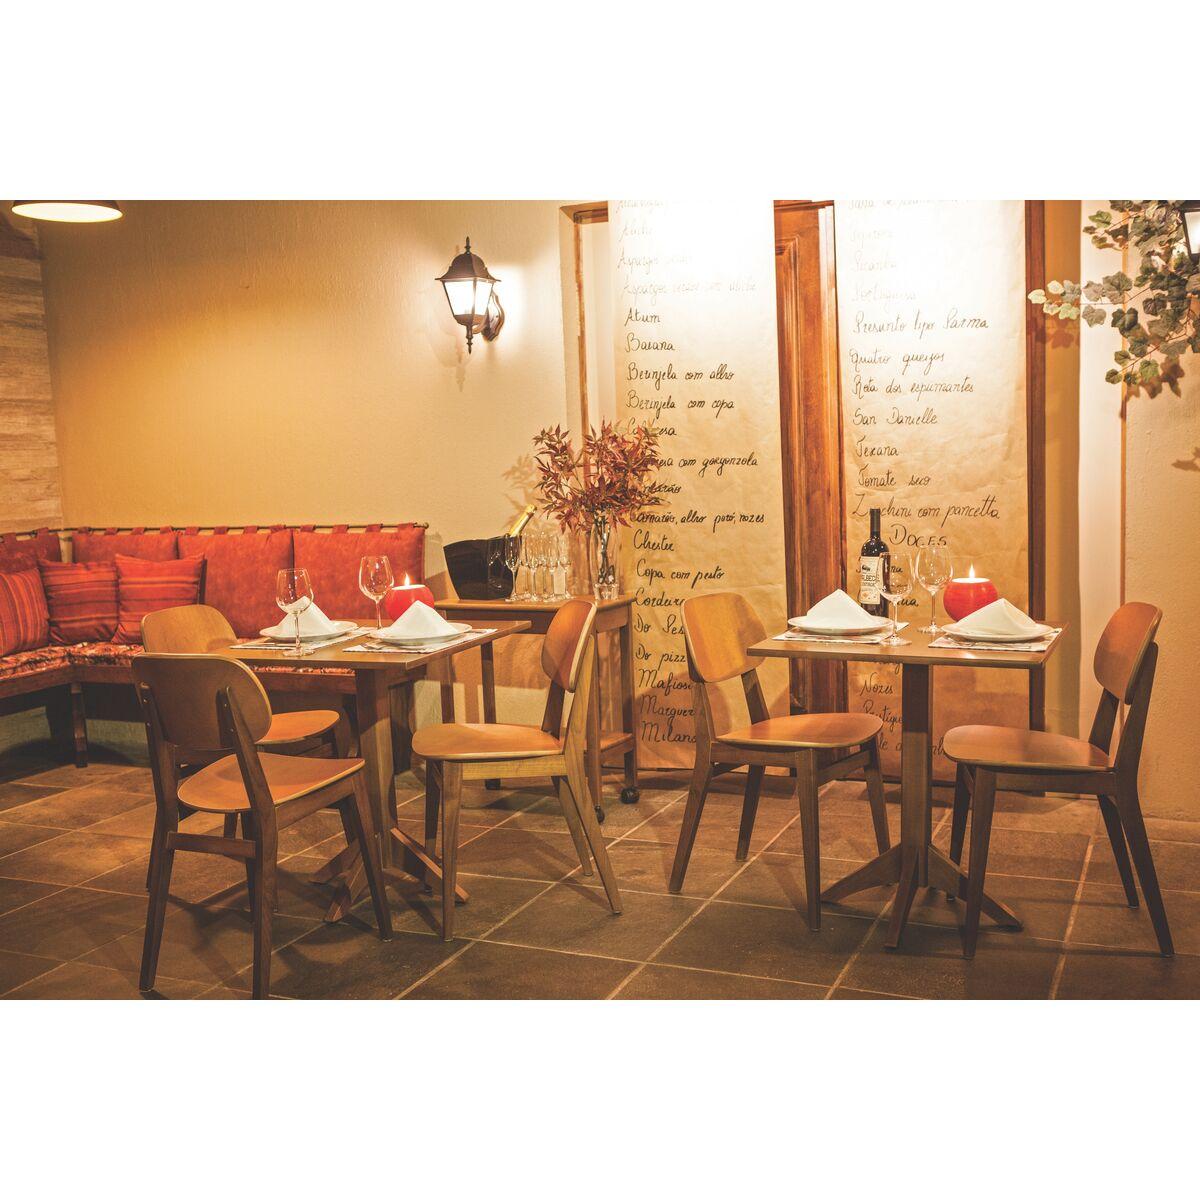 Tramontina mesa de madeira quadrada 4 lugares london for Sillas para fuente de soda